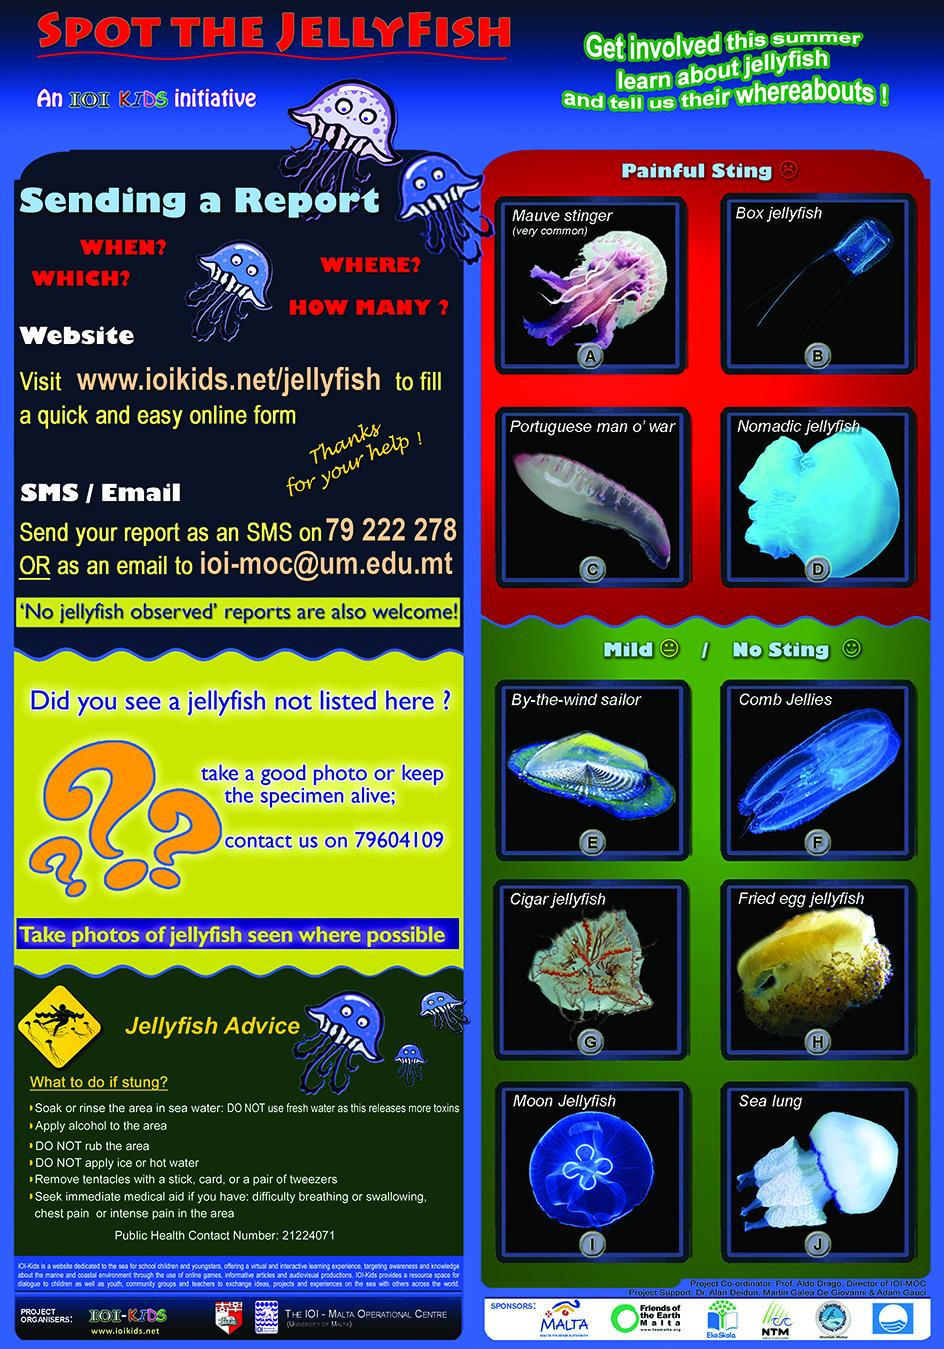 The jellyfish leaflet